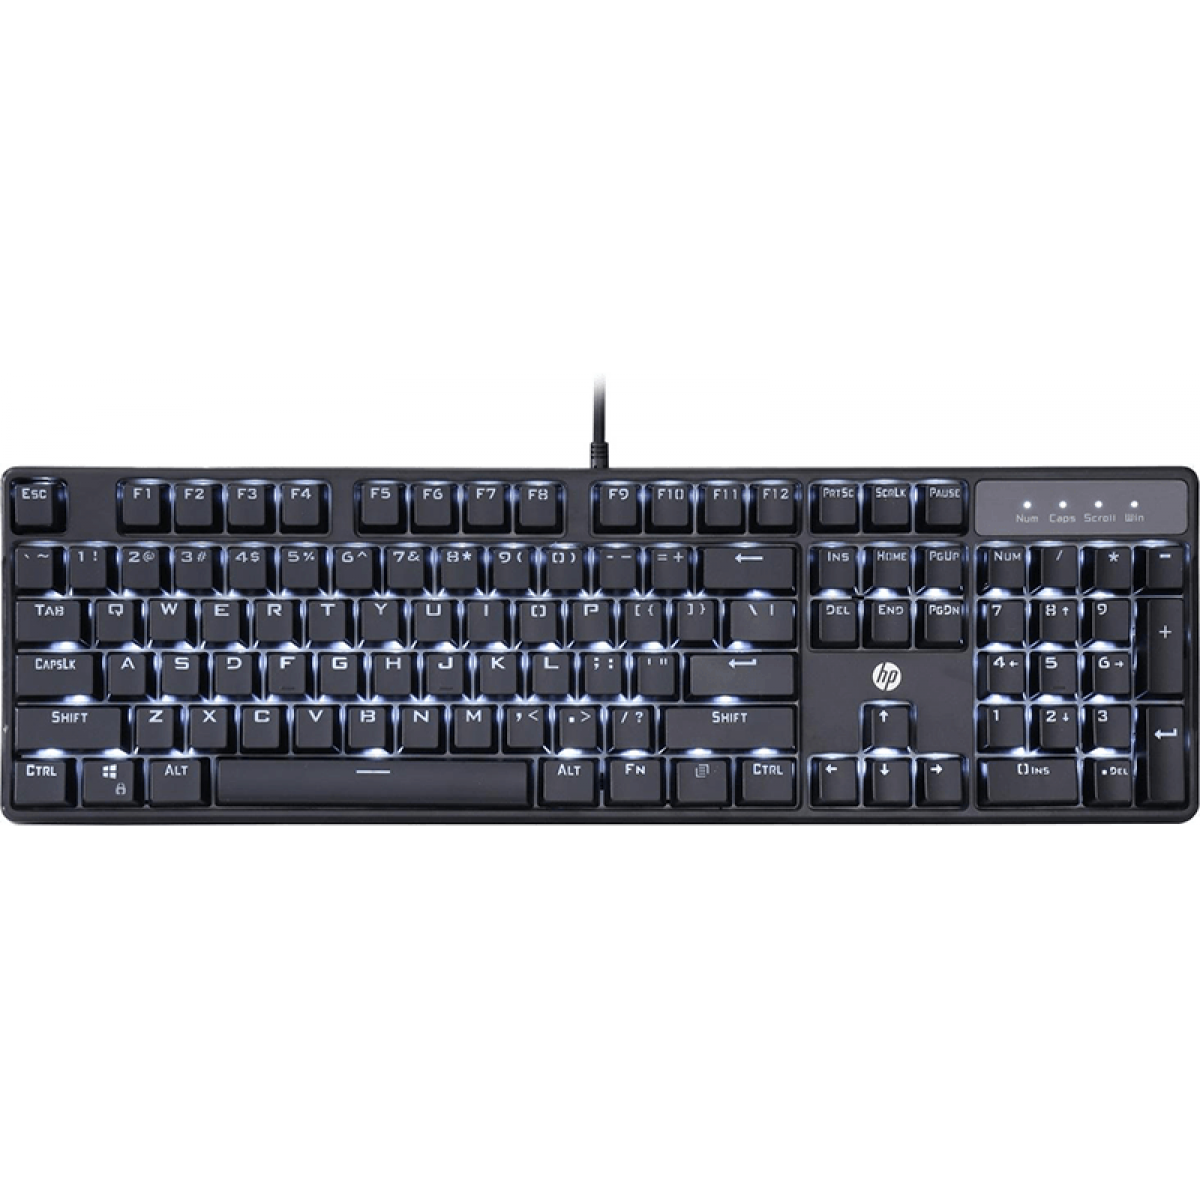 Teclado Mecânico Gamer HP GK320, Switch Blue, ABNT2, Black